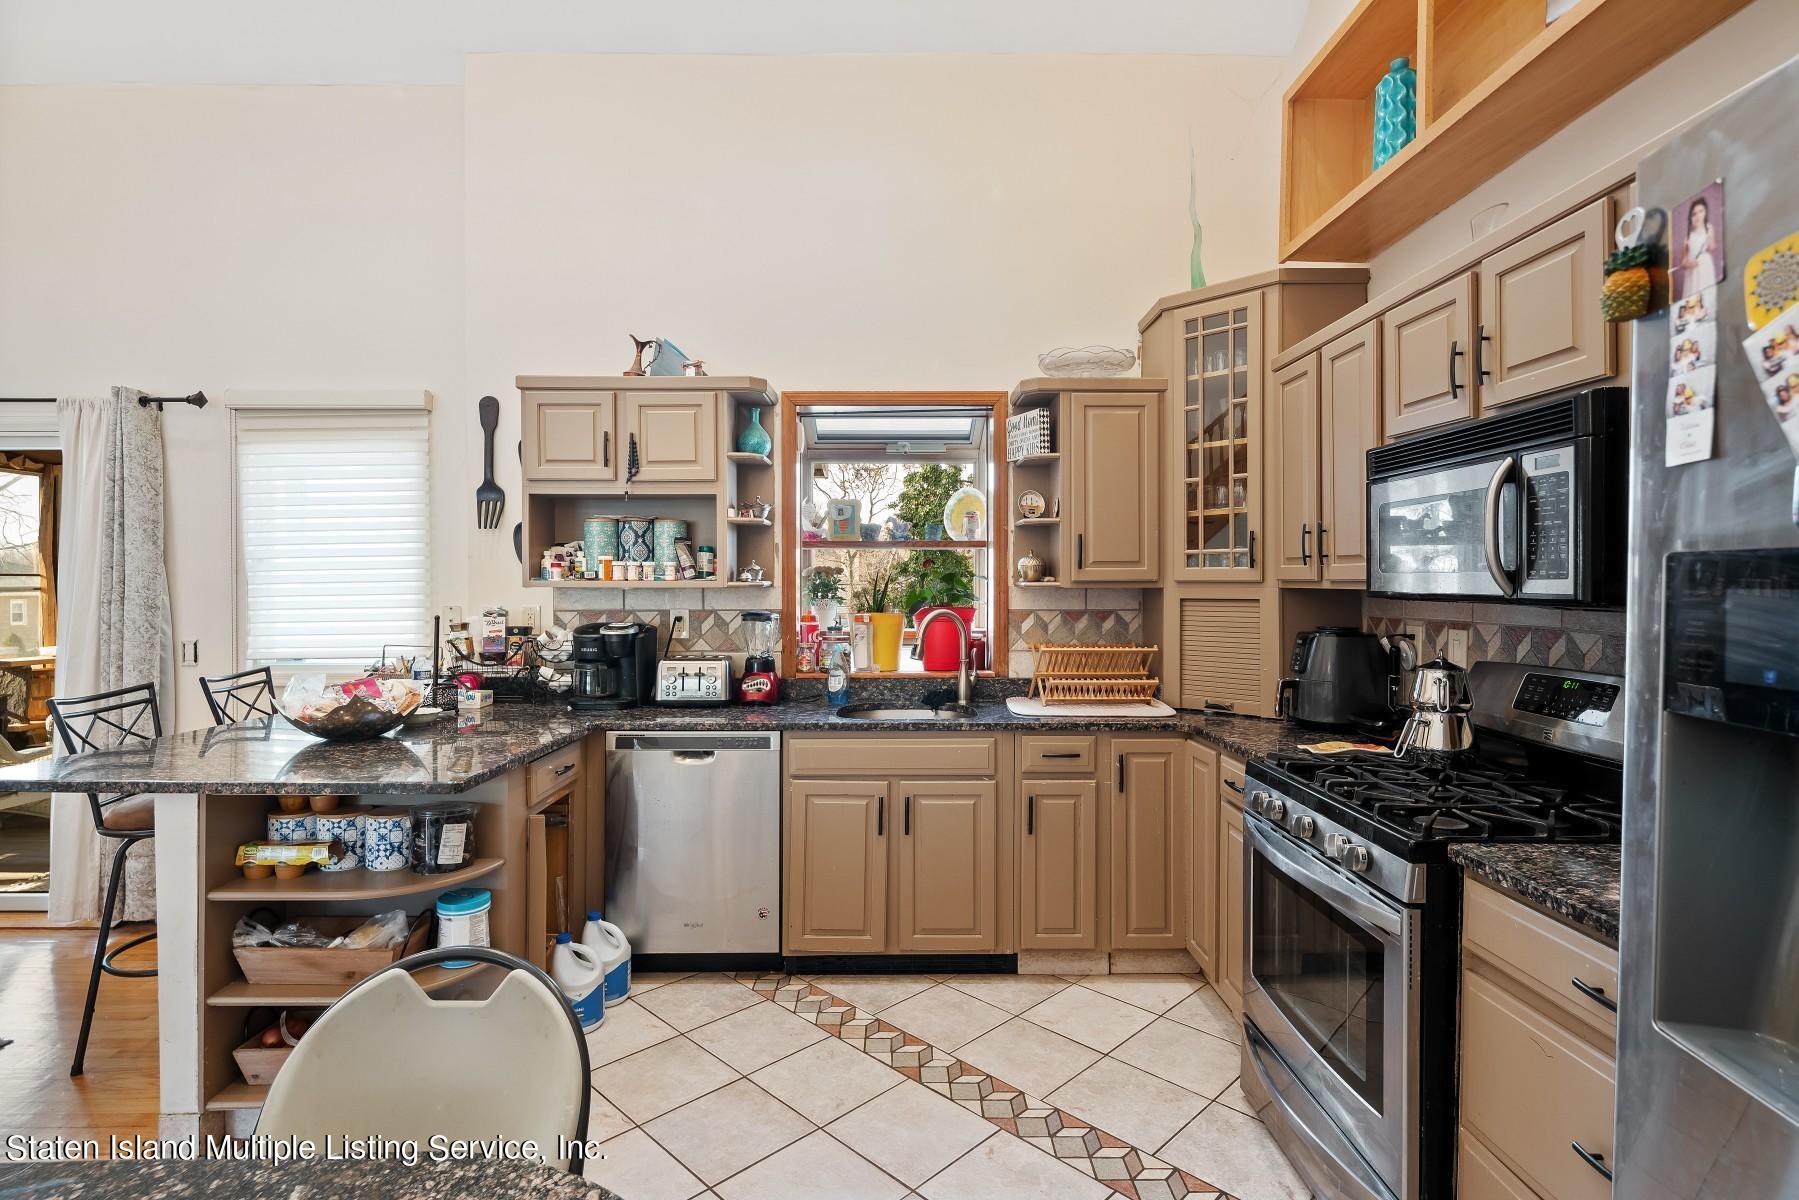 Single Family - Detached 8 Bionia Avenue  Staten Island, NY 10305, MLS-1142818-10